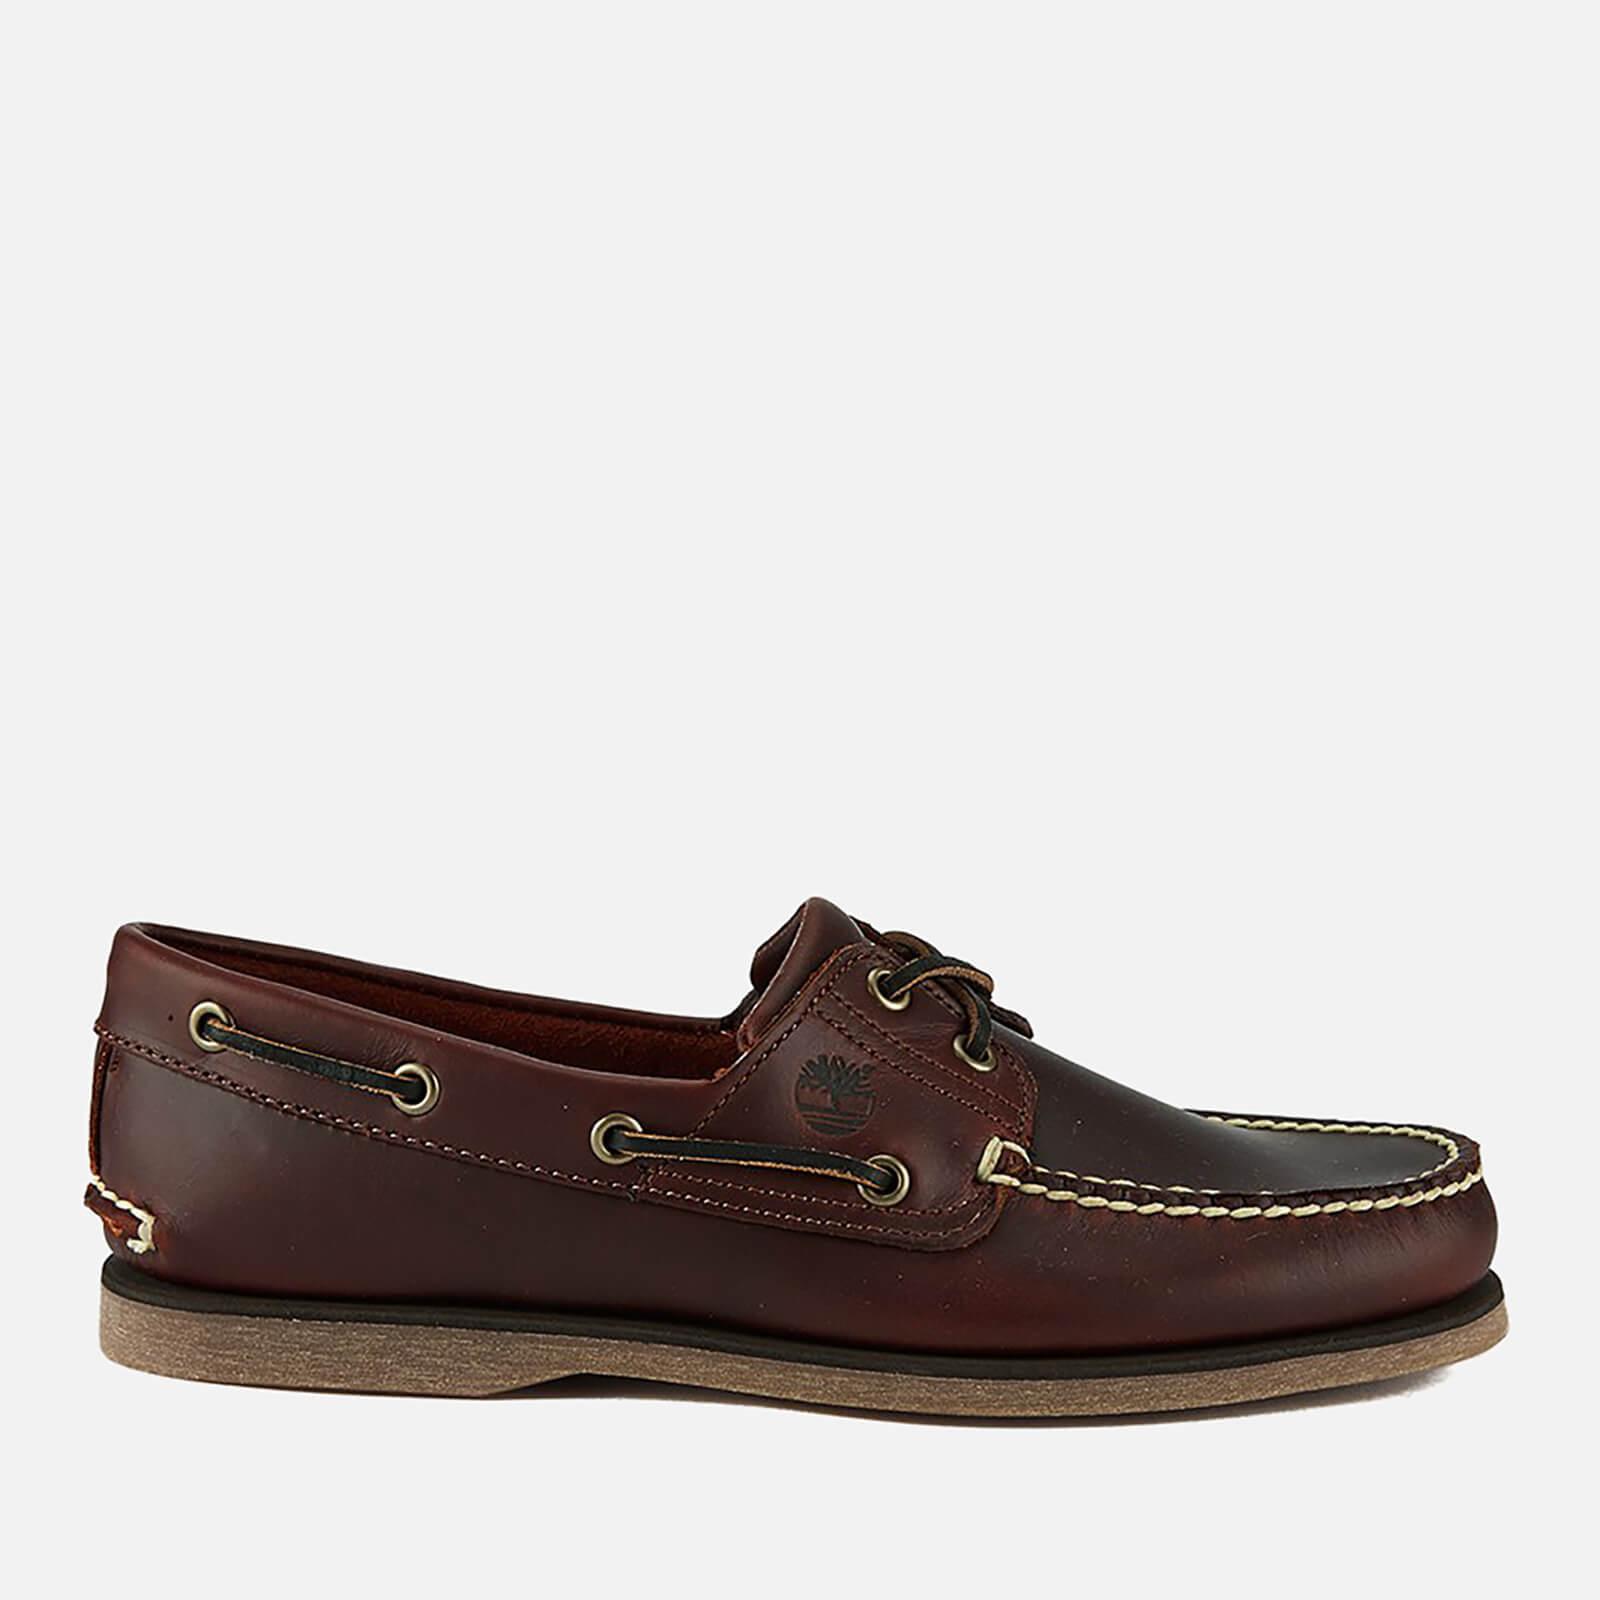 bueno sobrina Invertir  Timberland Men's Classic 2-Eye Boat Shoes - Rootbeer Smooth | TheHut.com